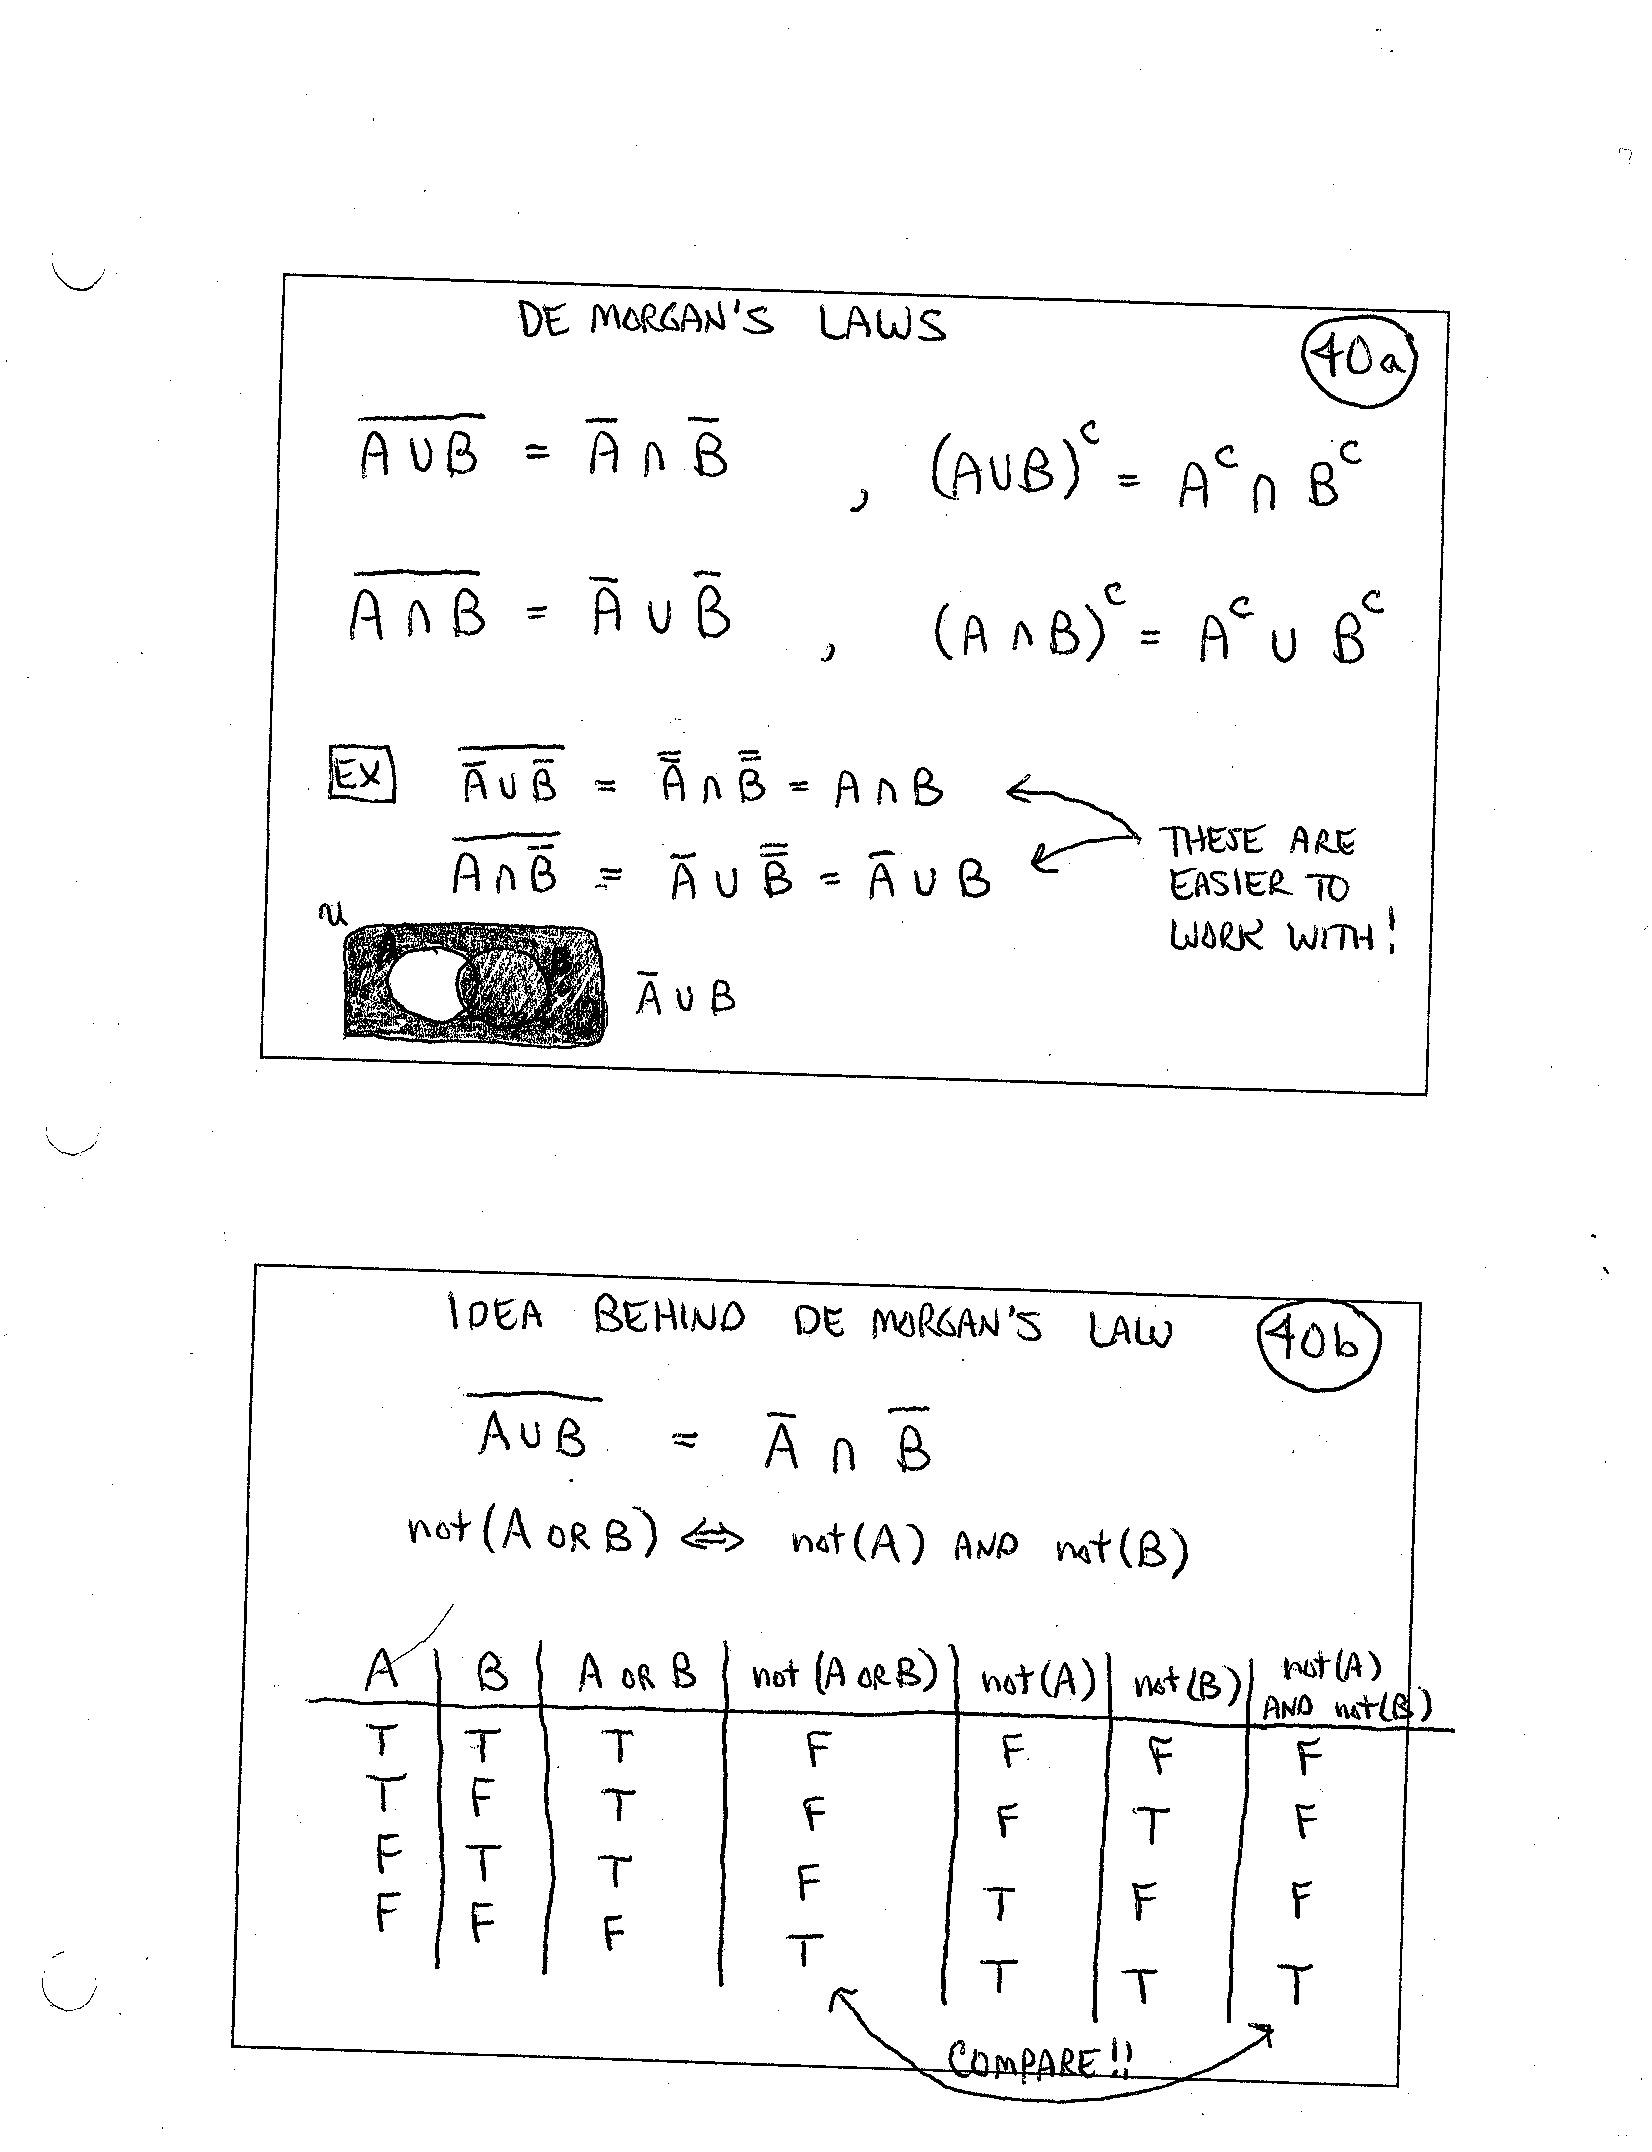 set notation venn diagram practice problems 2008 yamaha r6 wiring finite mathematics daily syllabus